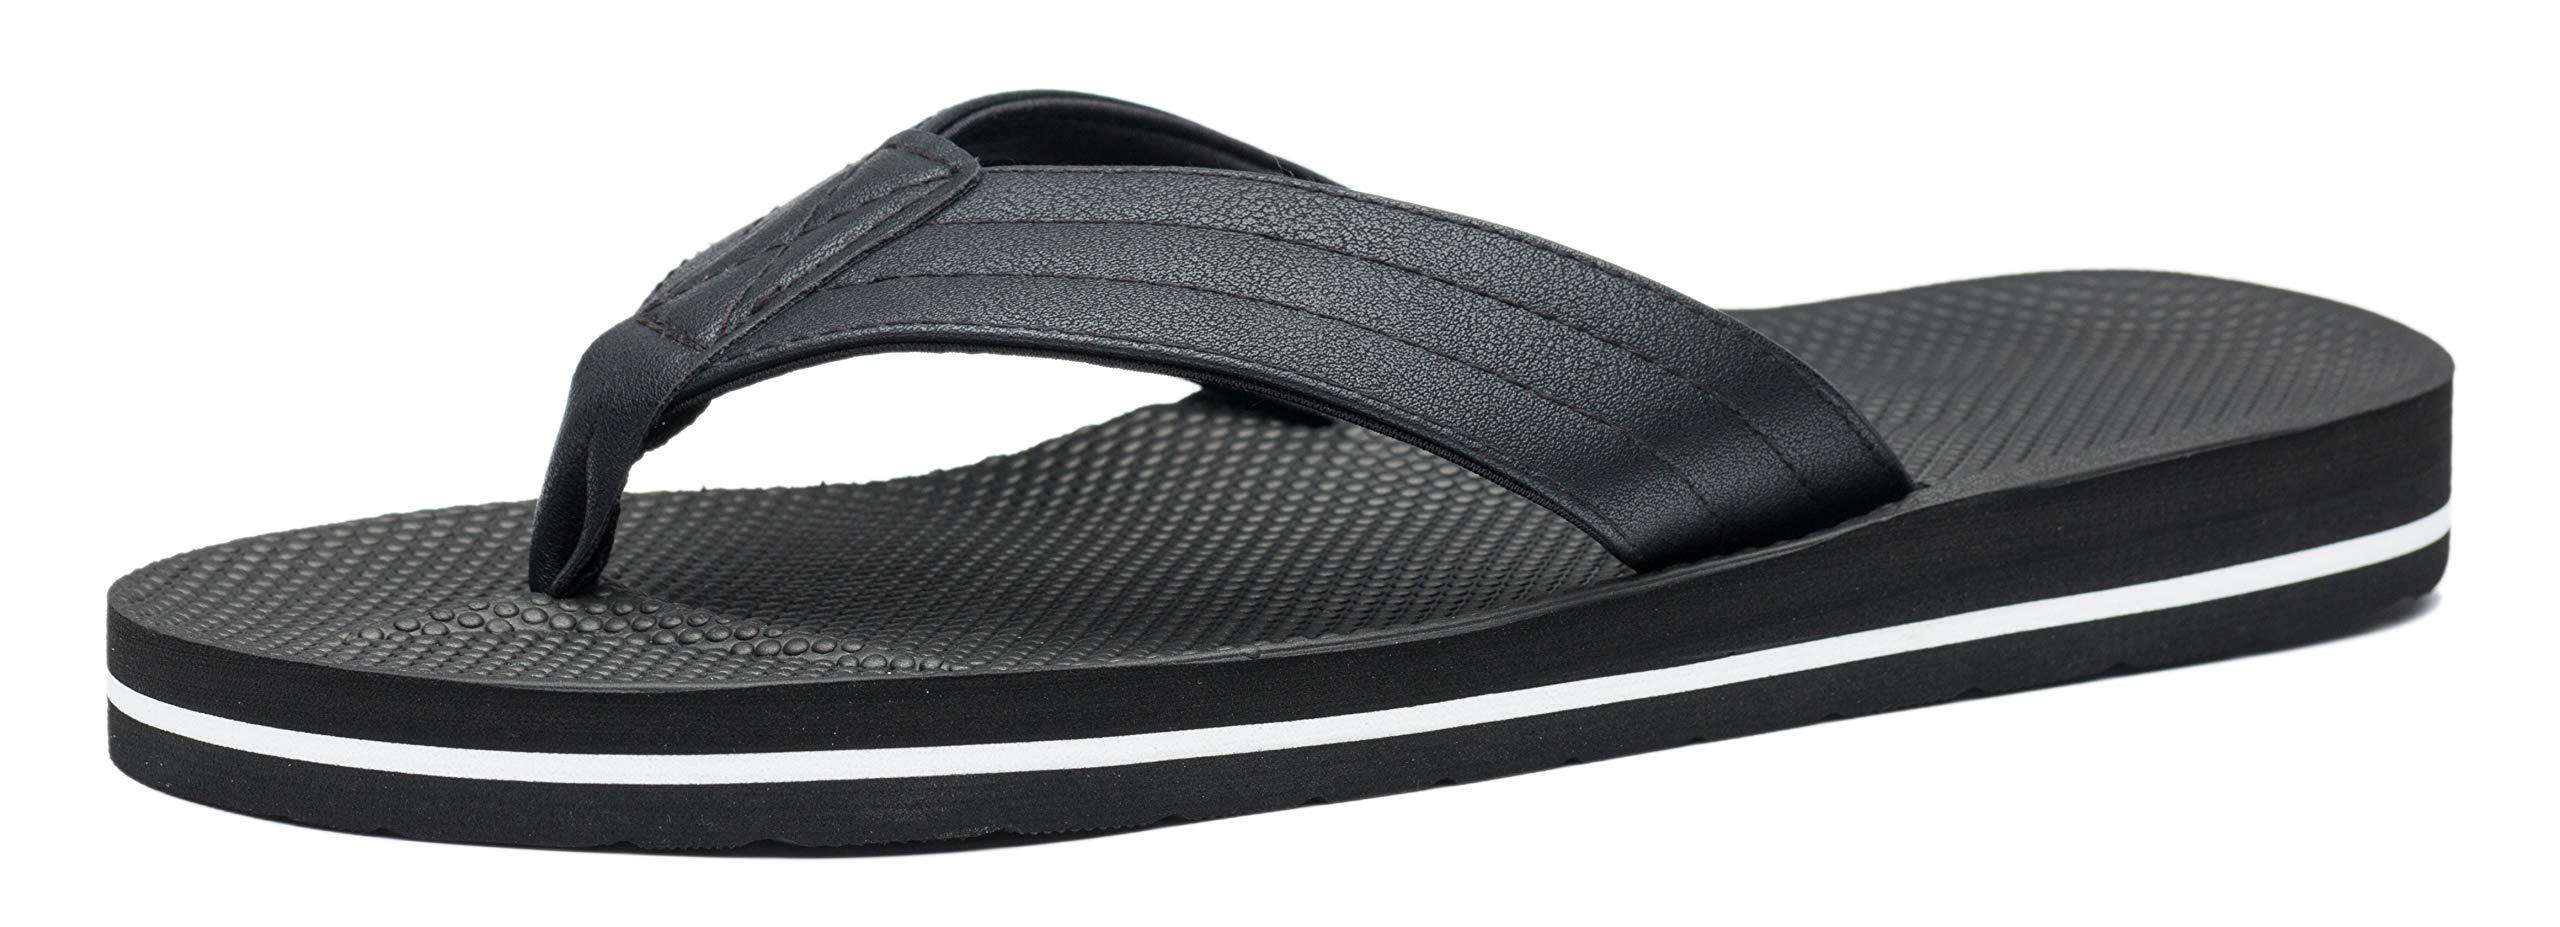 VIIHAHN Men's Flip Flops Summer Beach Sandals Extra Large Size Arch Support Slippers